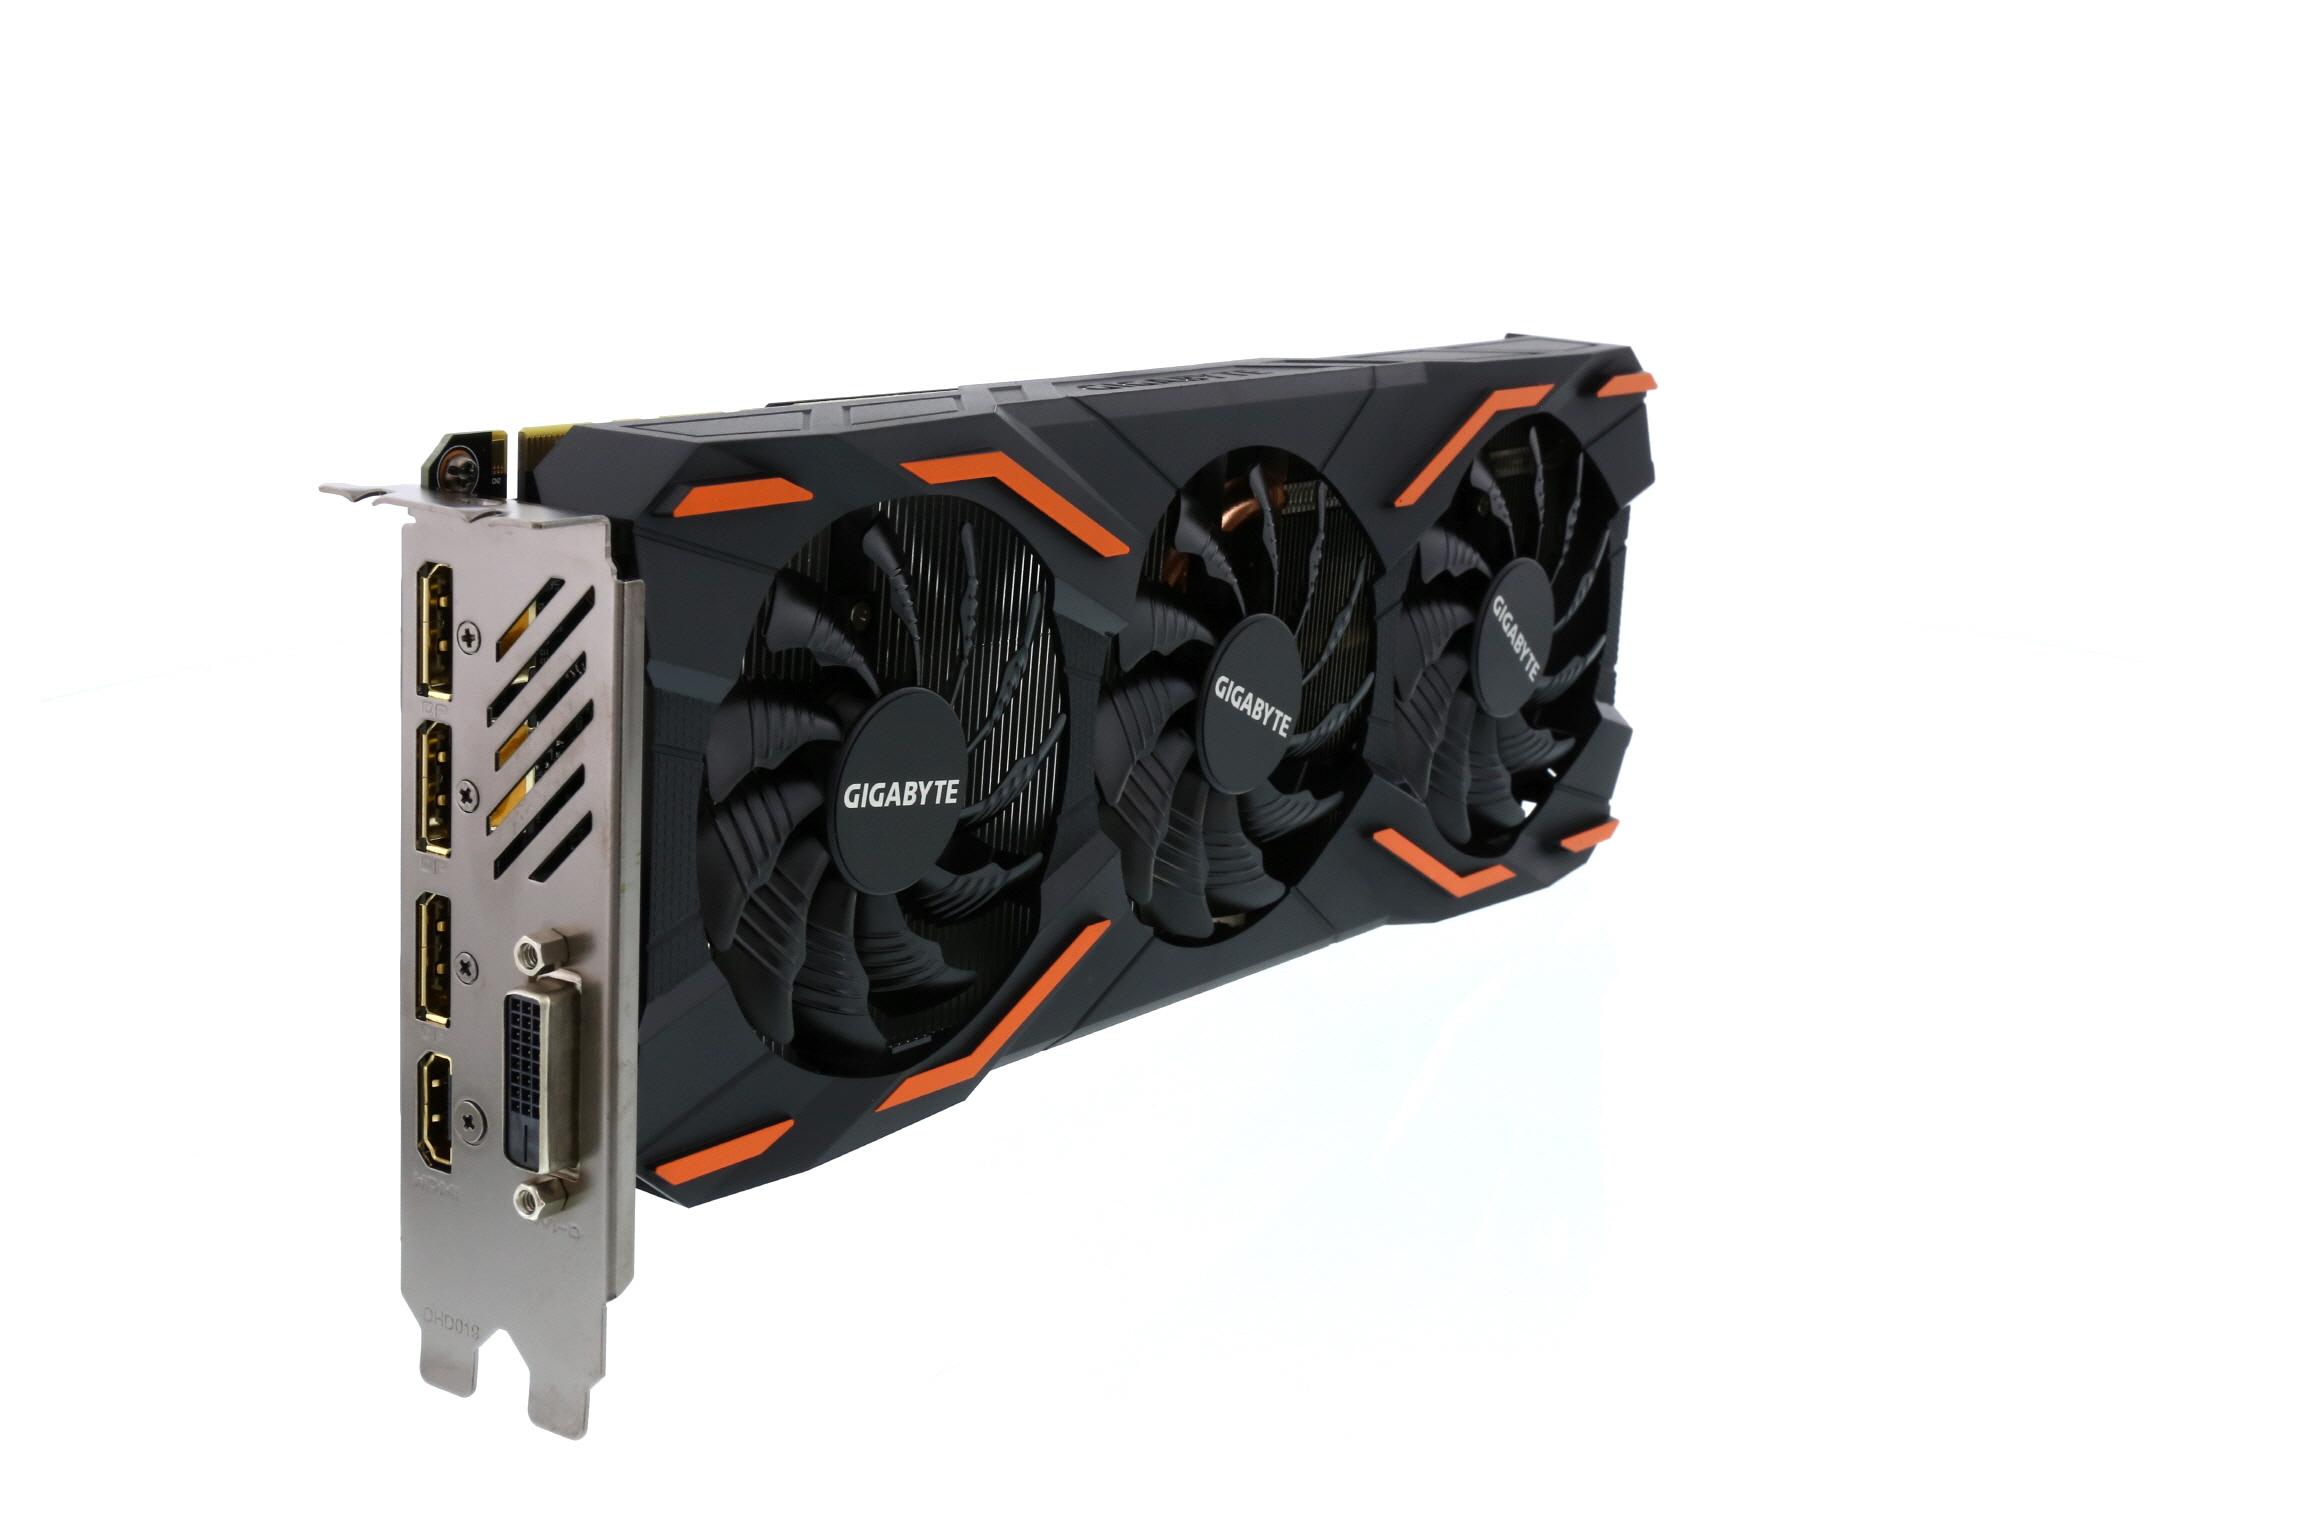 GIGABYTE GeForce GTX 1080 DirectX 12 GV-N1080WF3OC-8GD 8GB 256-Bit GDDR5X PCI Express 3.0 x16 ATX Video Card  - $460 with 50 off 500 code